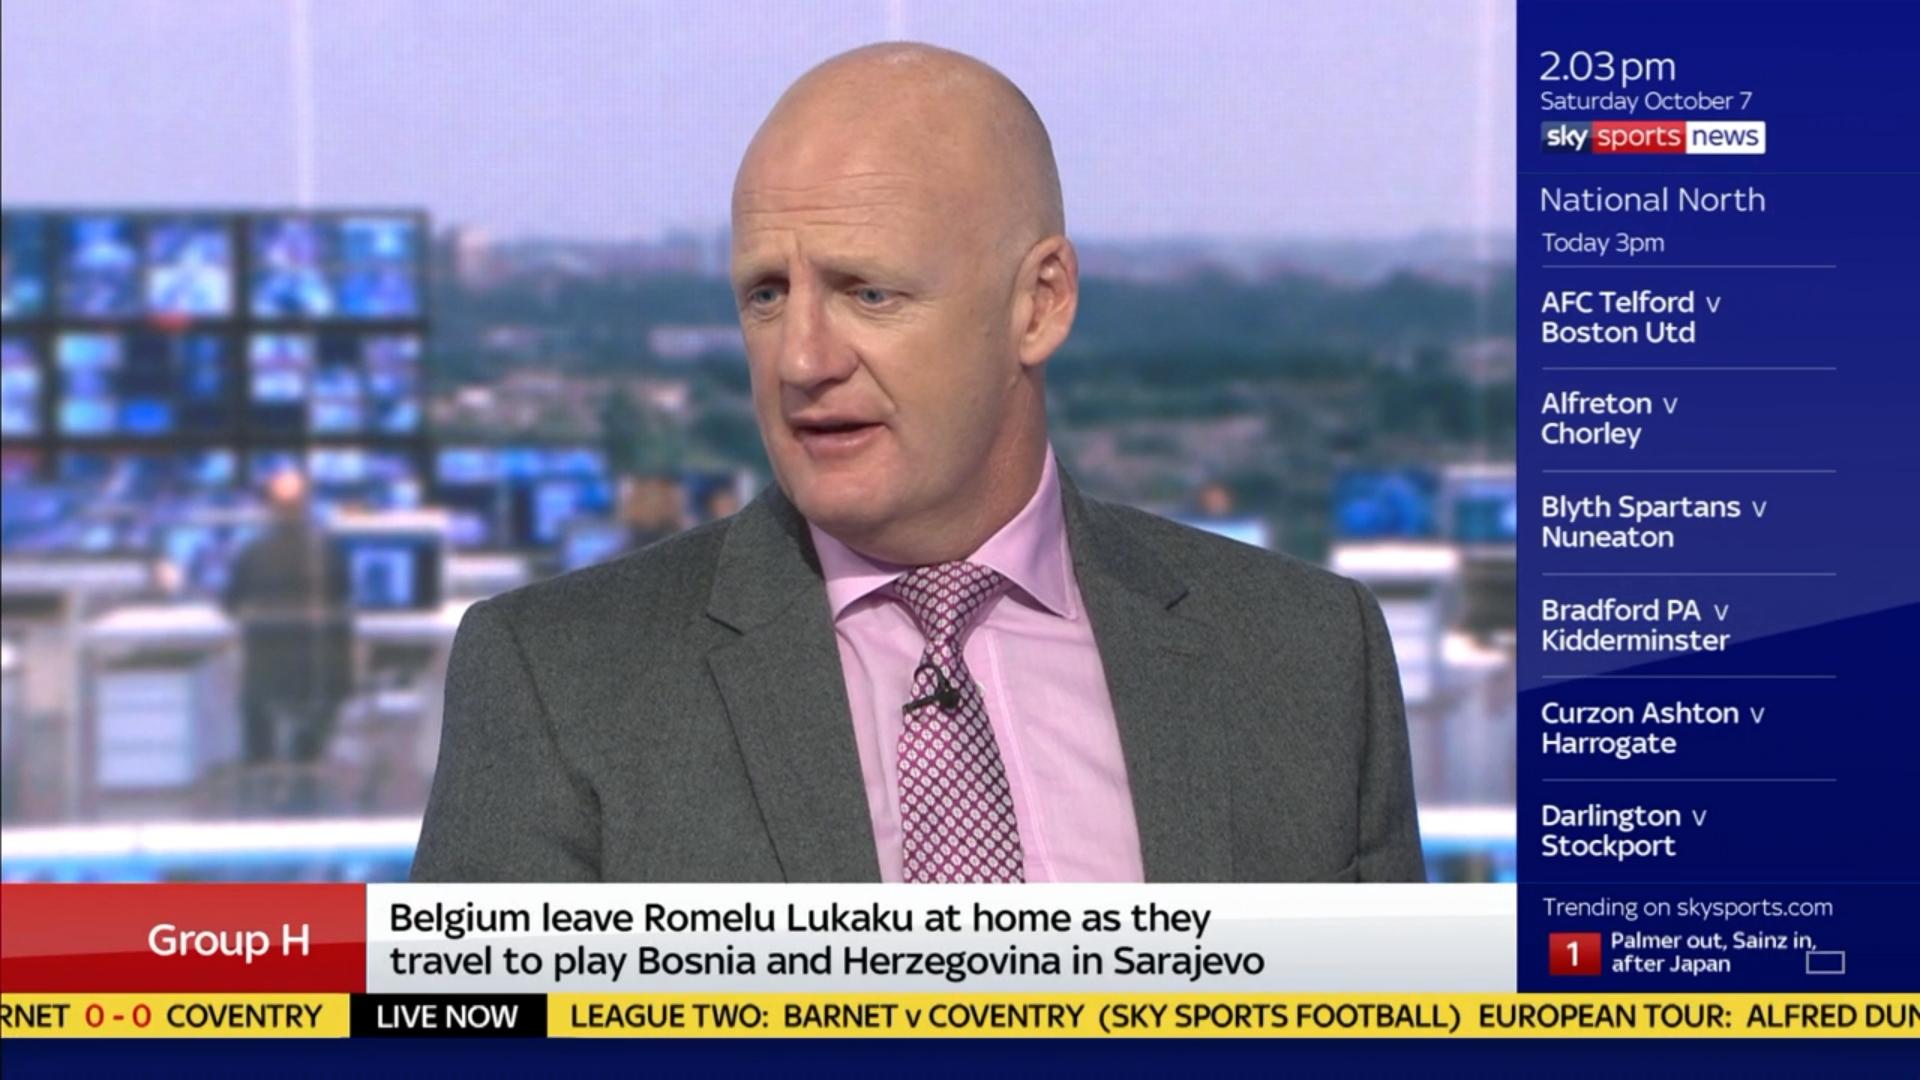 Iain Dowie - Sky Sports Football (4)